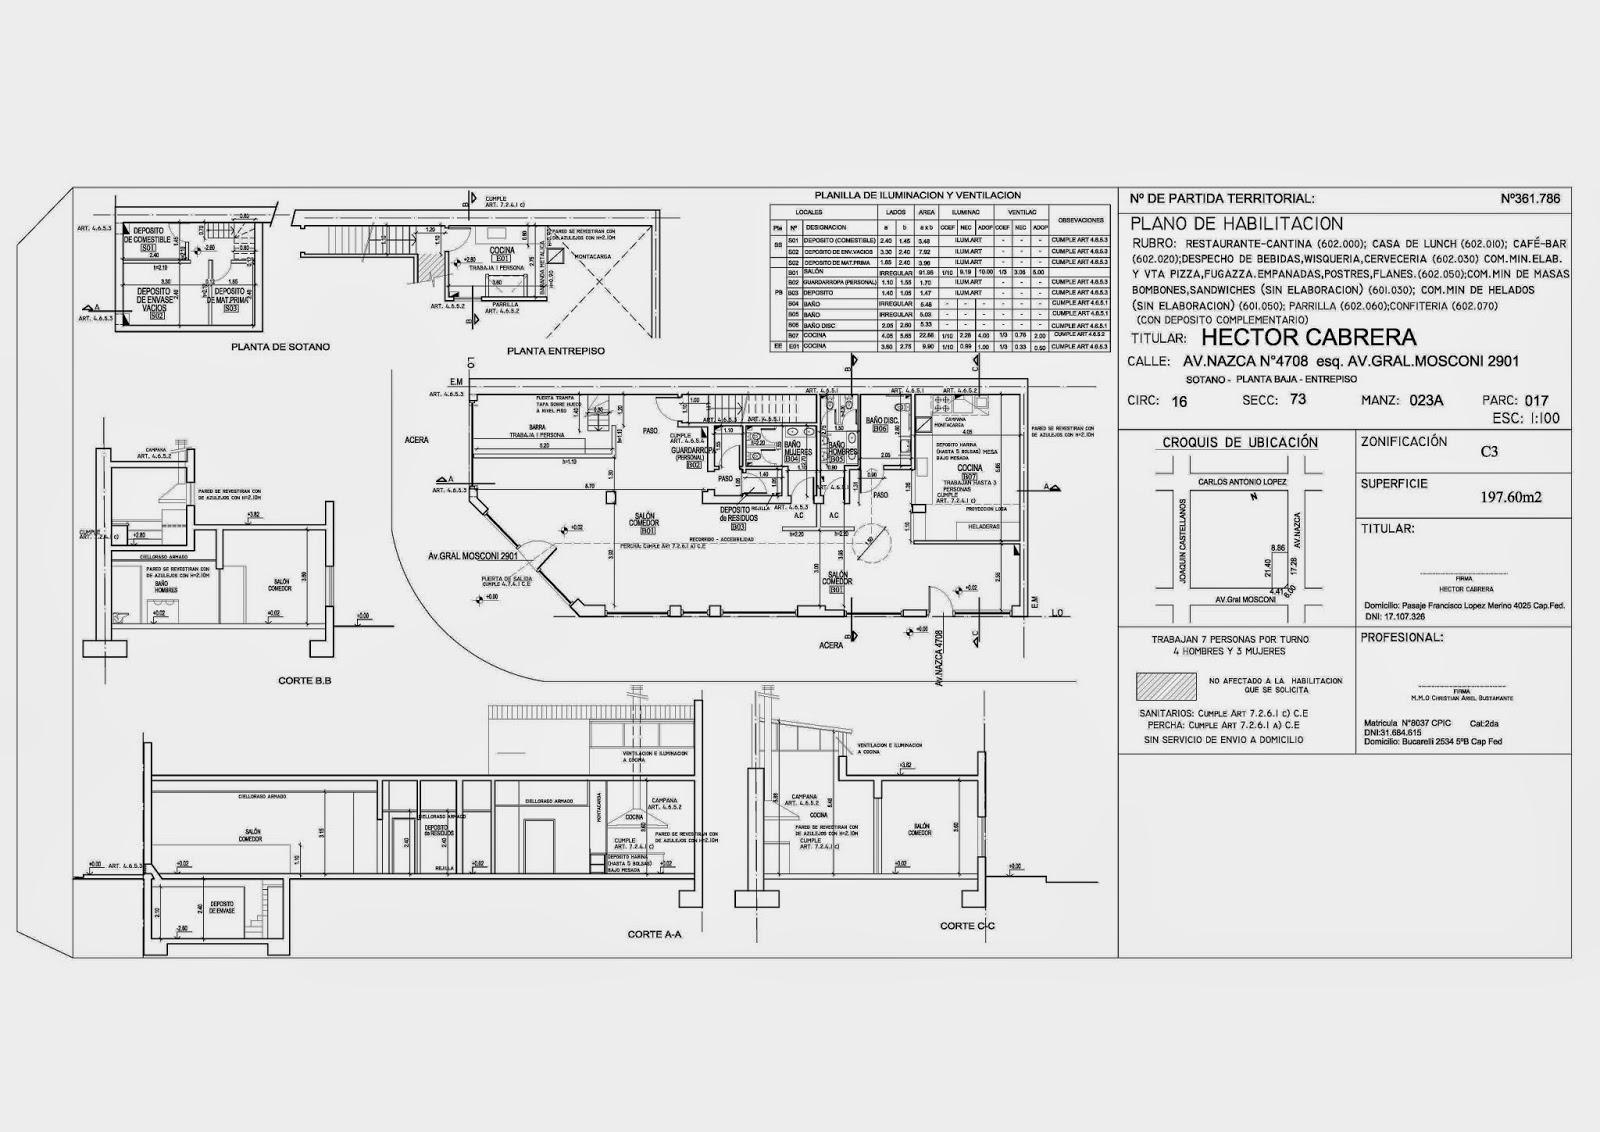 Ultra arquitectura plano de habilitacion comercial for Plano restaurante